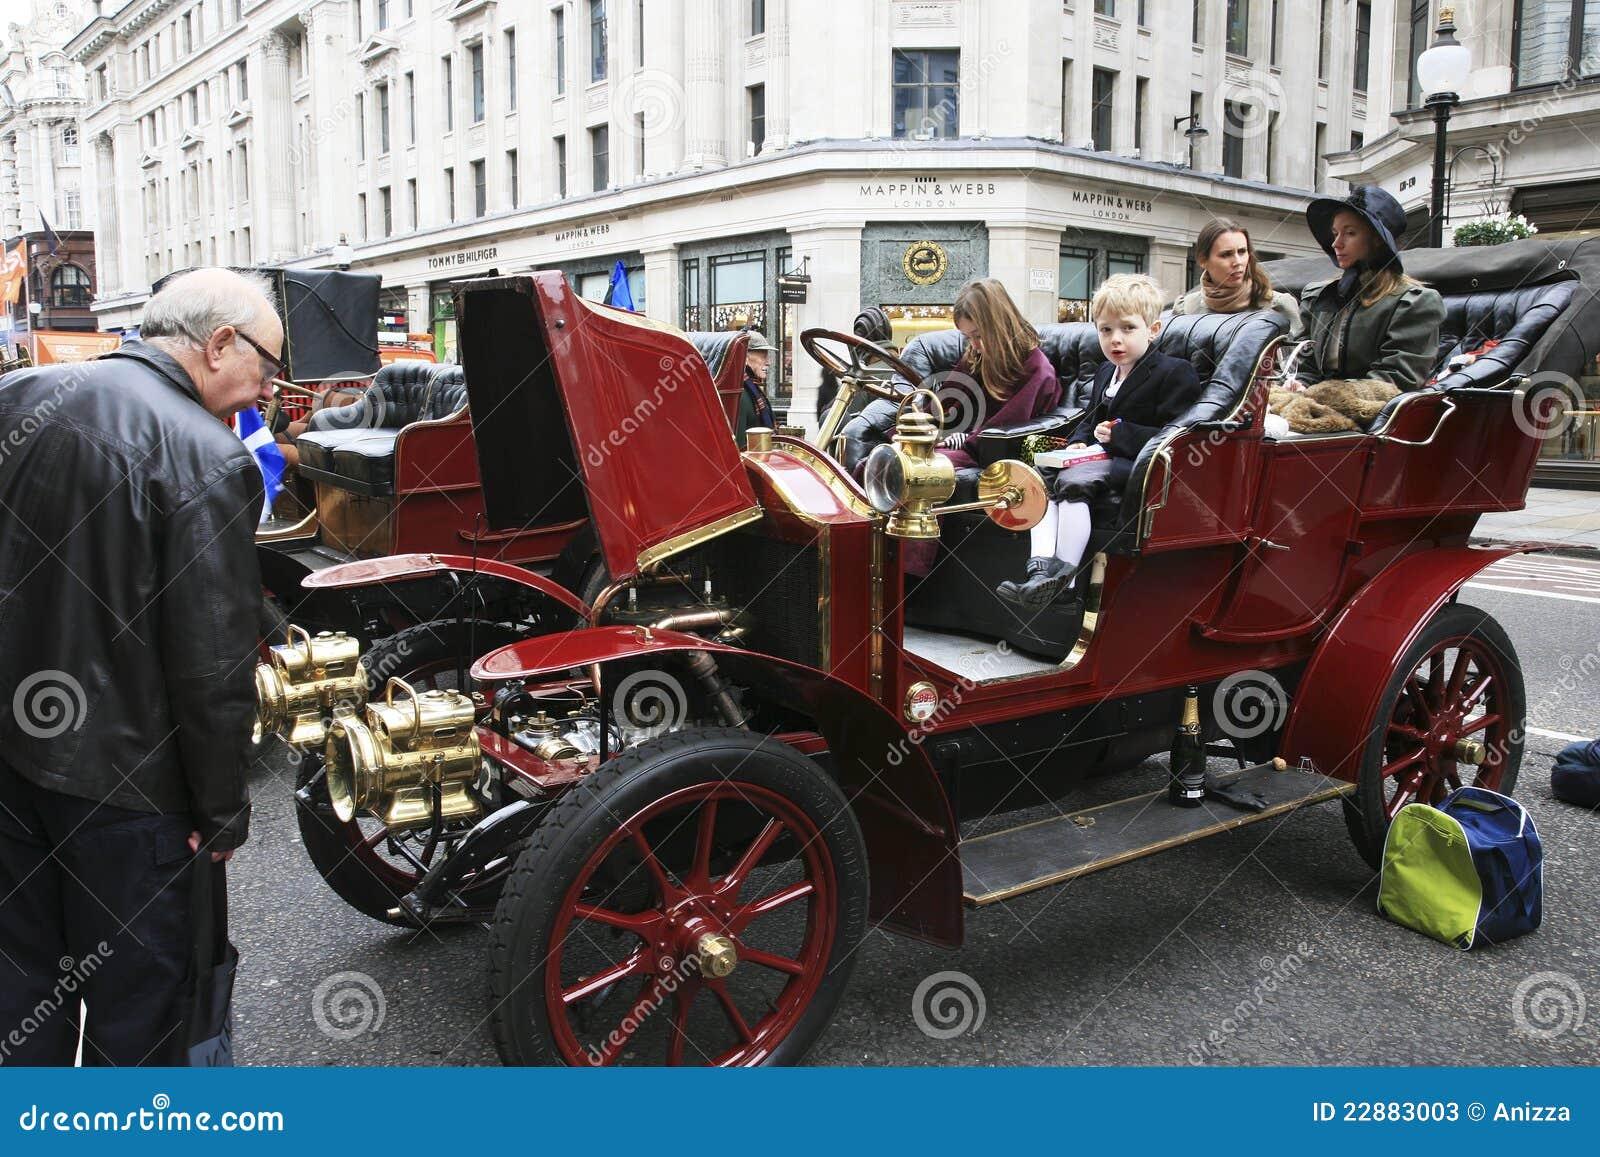 London To Brighton Veteran Car Run Editorial Stock Photo - Image of ...